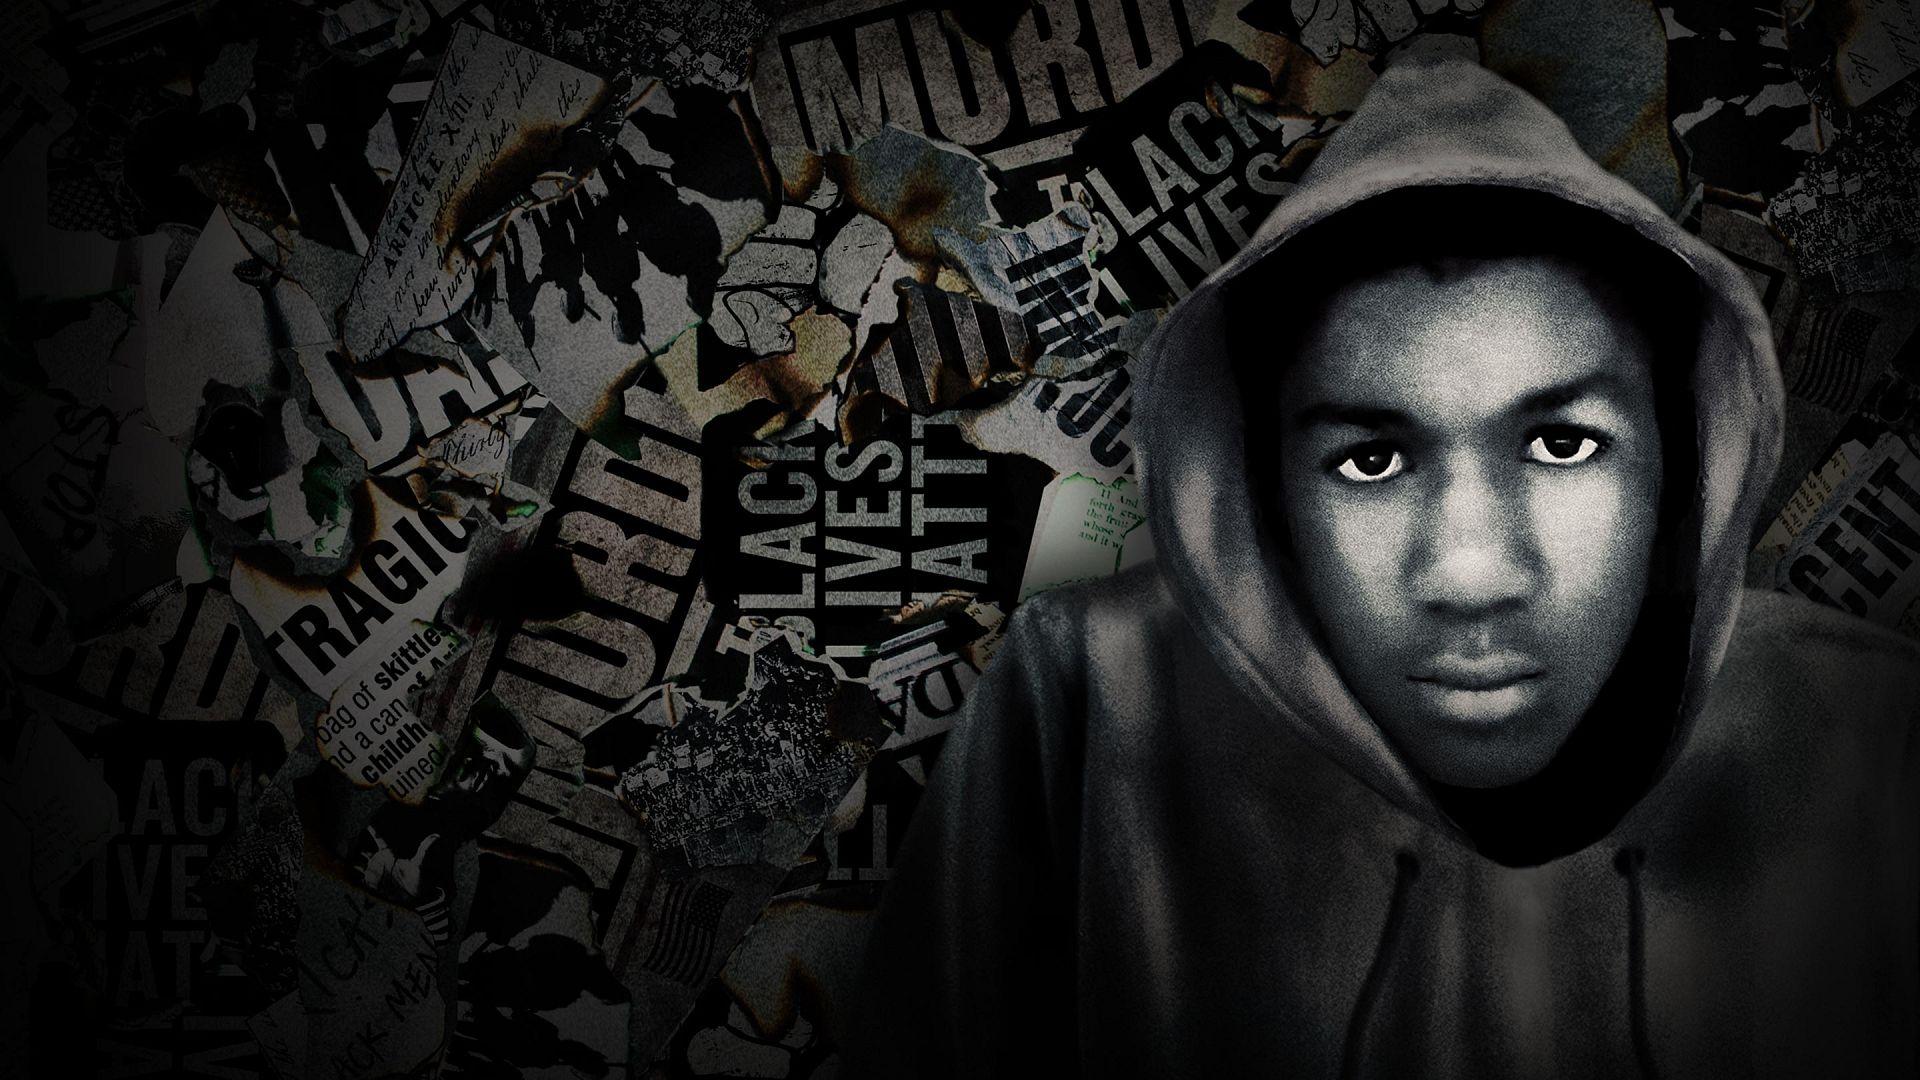 Trayvon martin movie on bet tonight fox sports online supercross betting